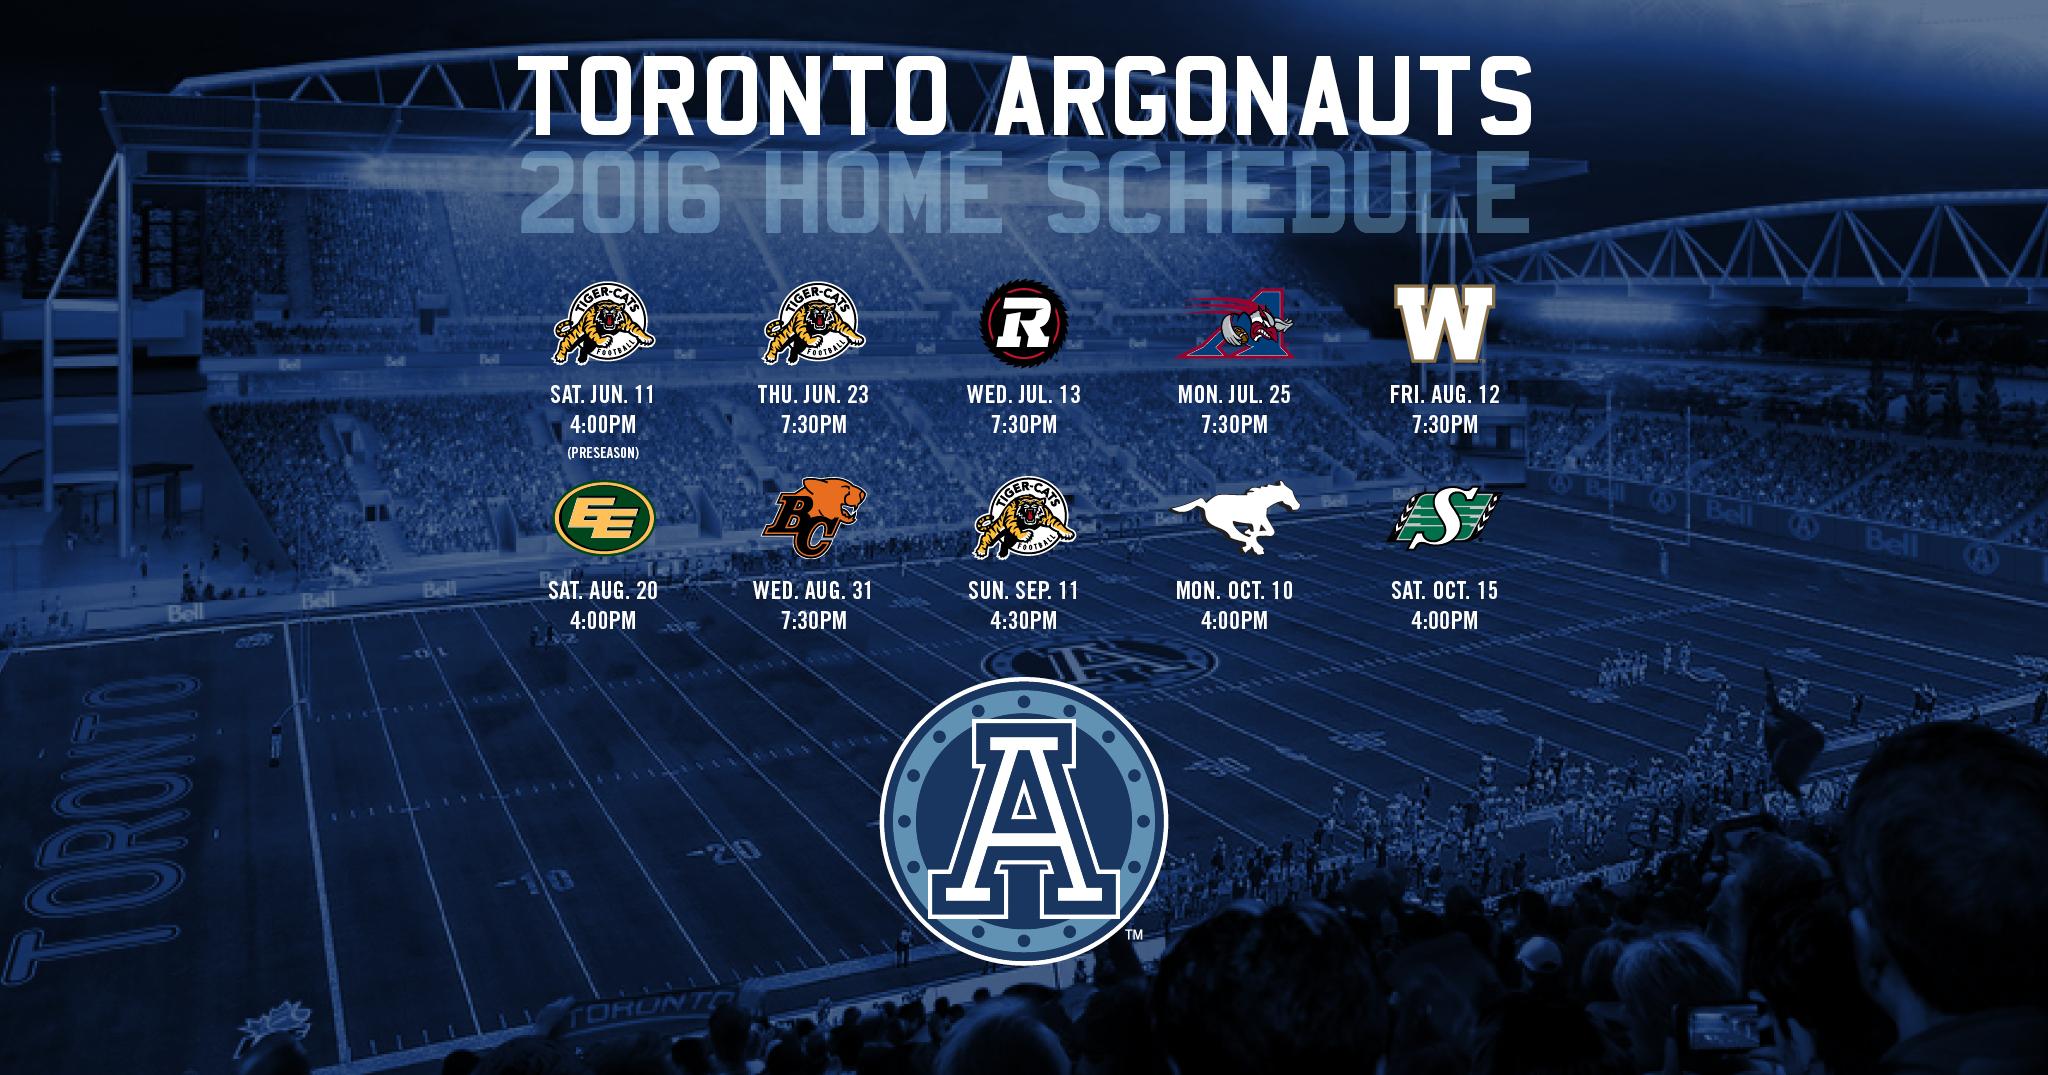 2016 Schedule now Available - Toronto Argonauts